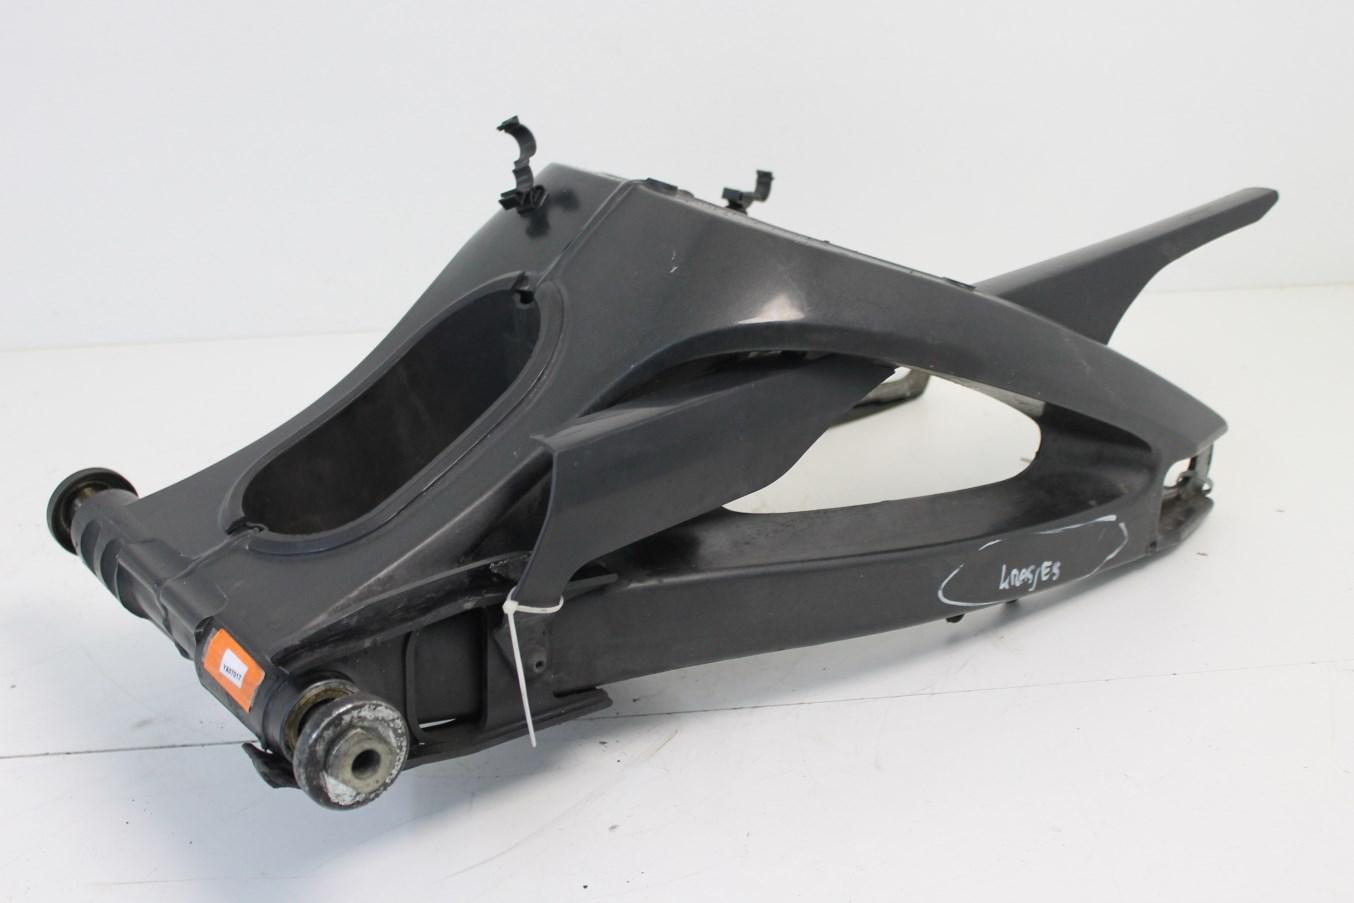 yamaha r6 rj05 schwinge hinterradschwinge swingarm 2003. Black Bedroom Furniture Sets. Home Design Ideas